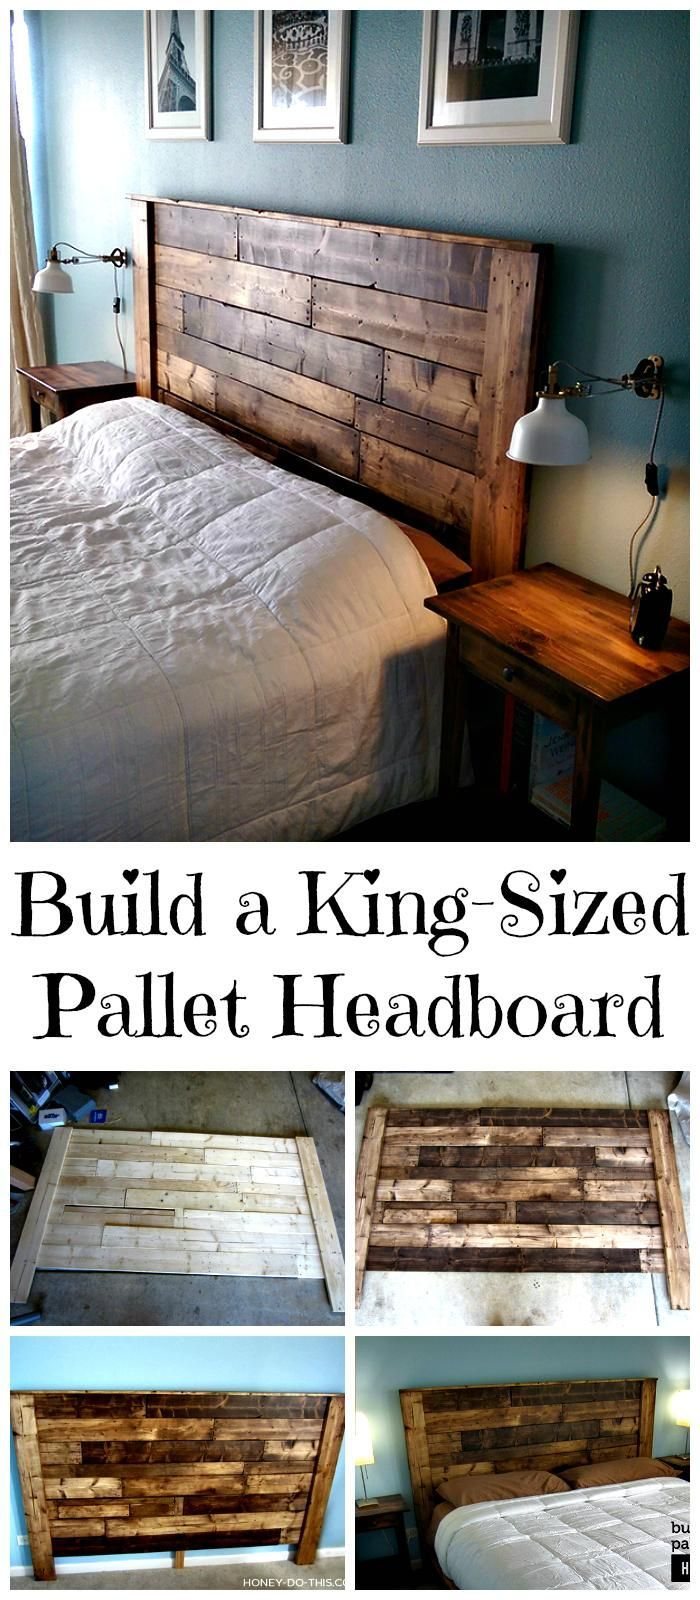 DIY King-Sized Pallet Headboard Tutorial - 150 Best DIY ...